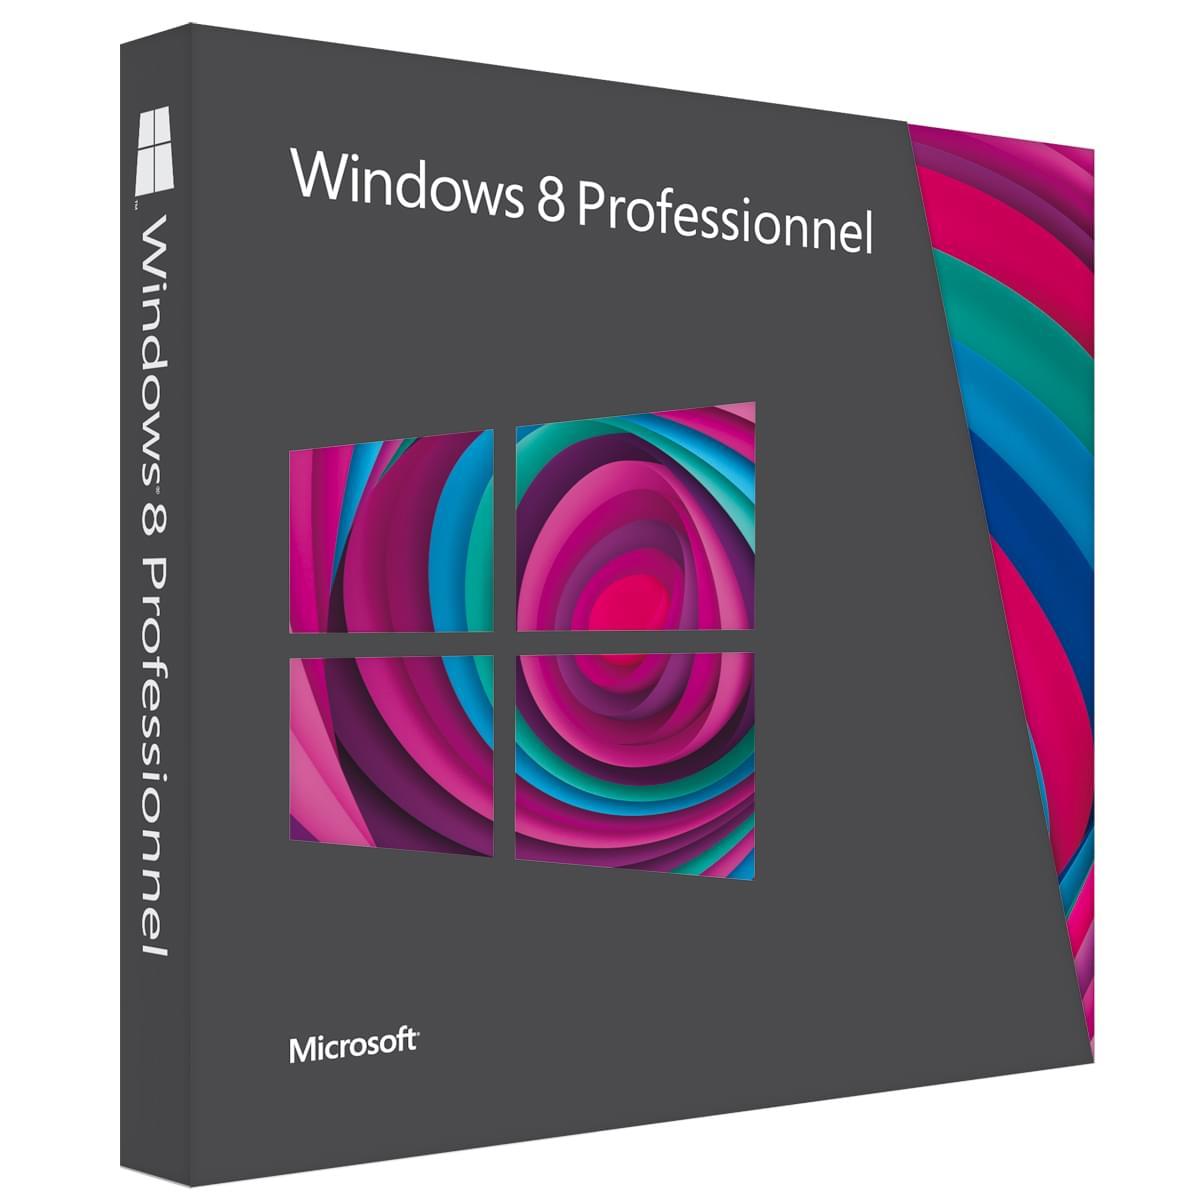 Microsoft MAJ Windows 8 Professionnel - Logiciel système exploitation - 0